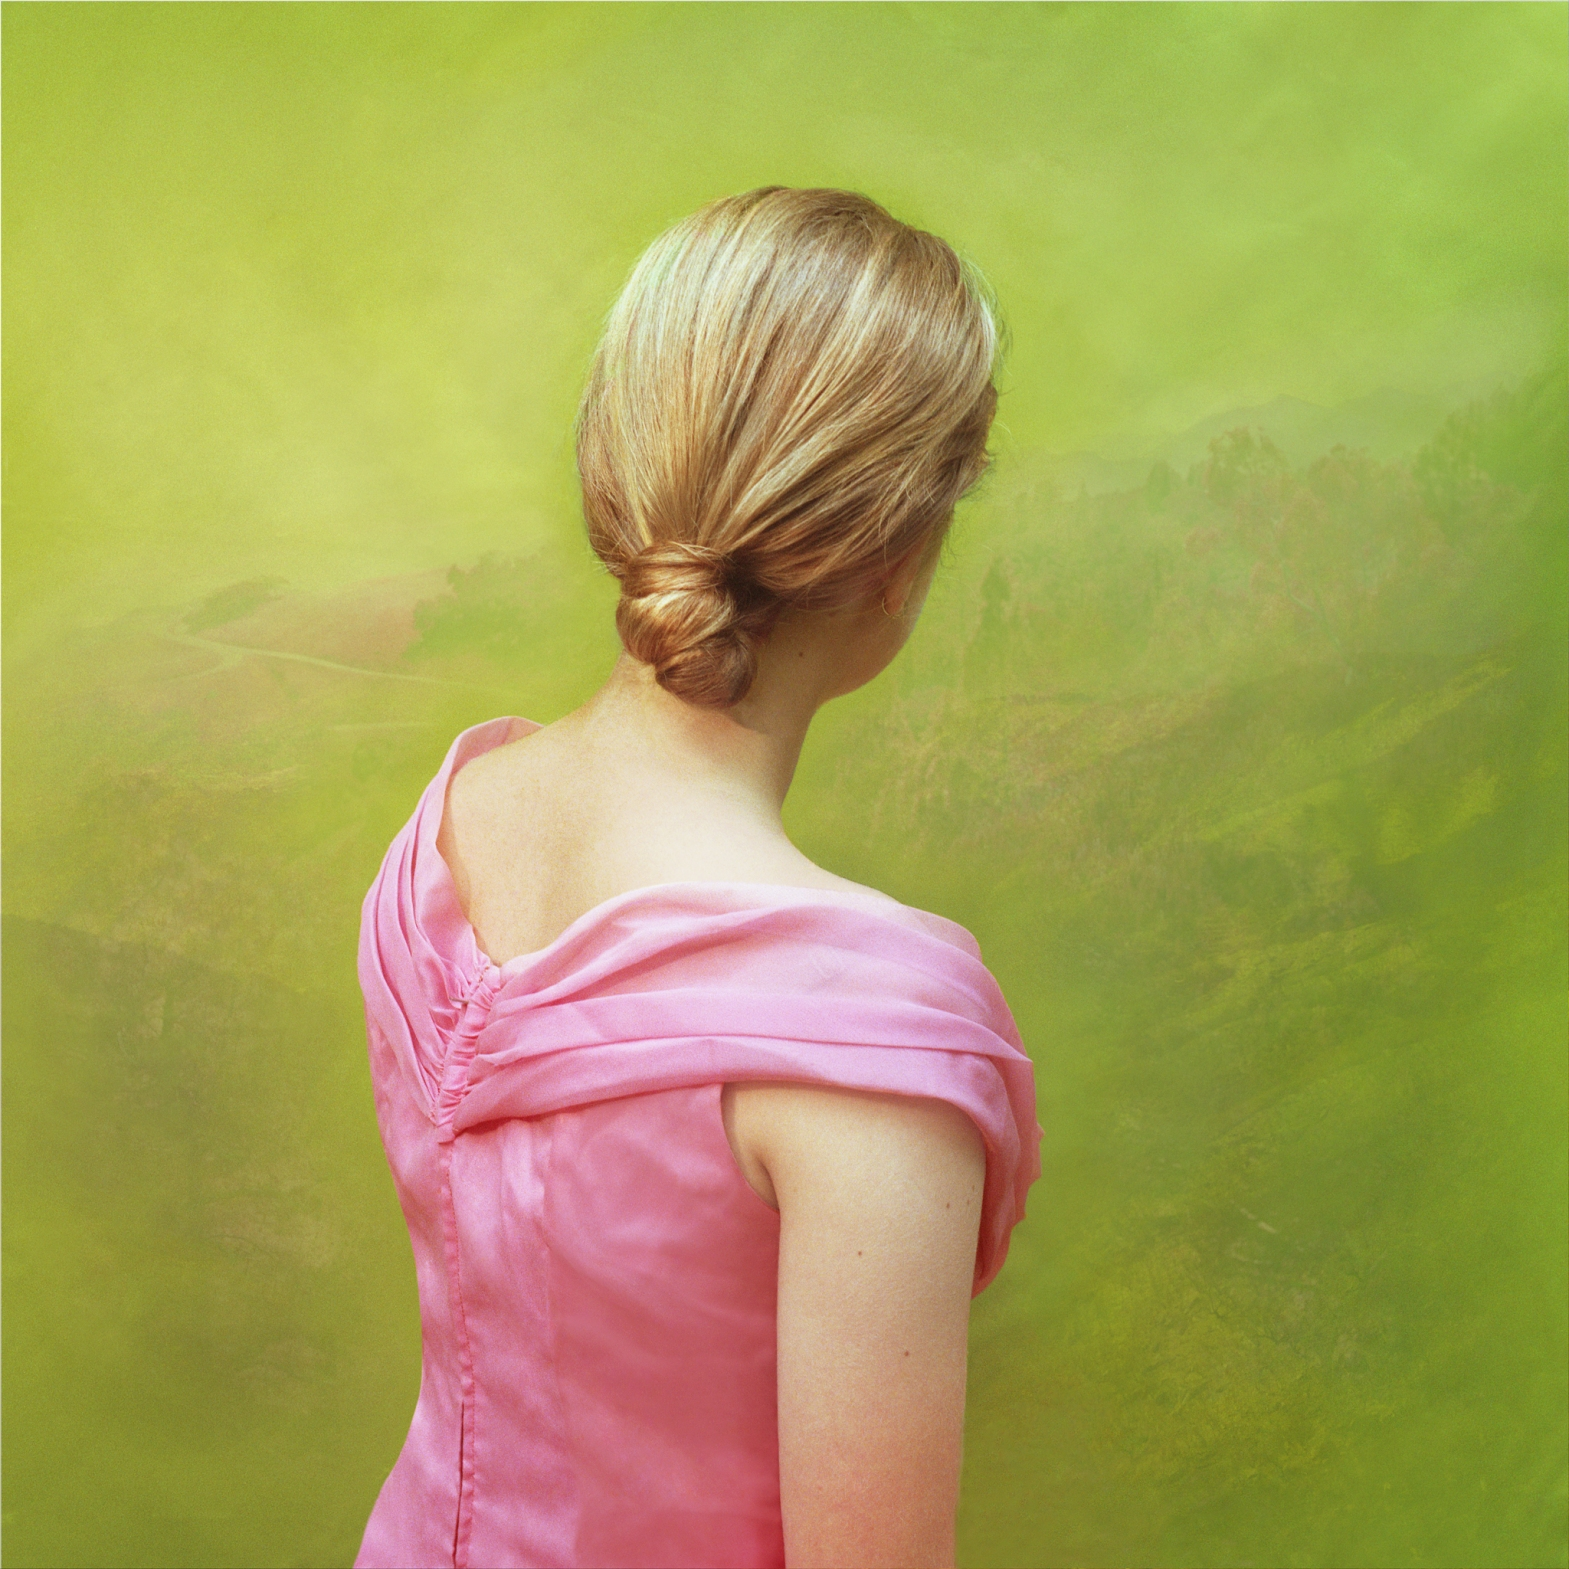 Lexie Turned © Aline Smithson